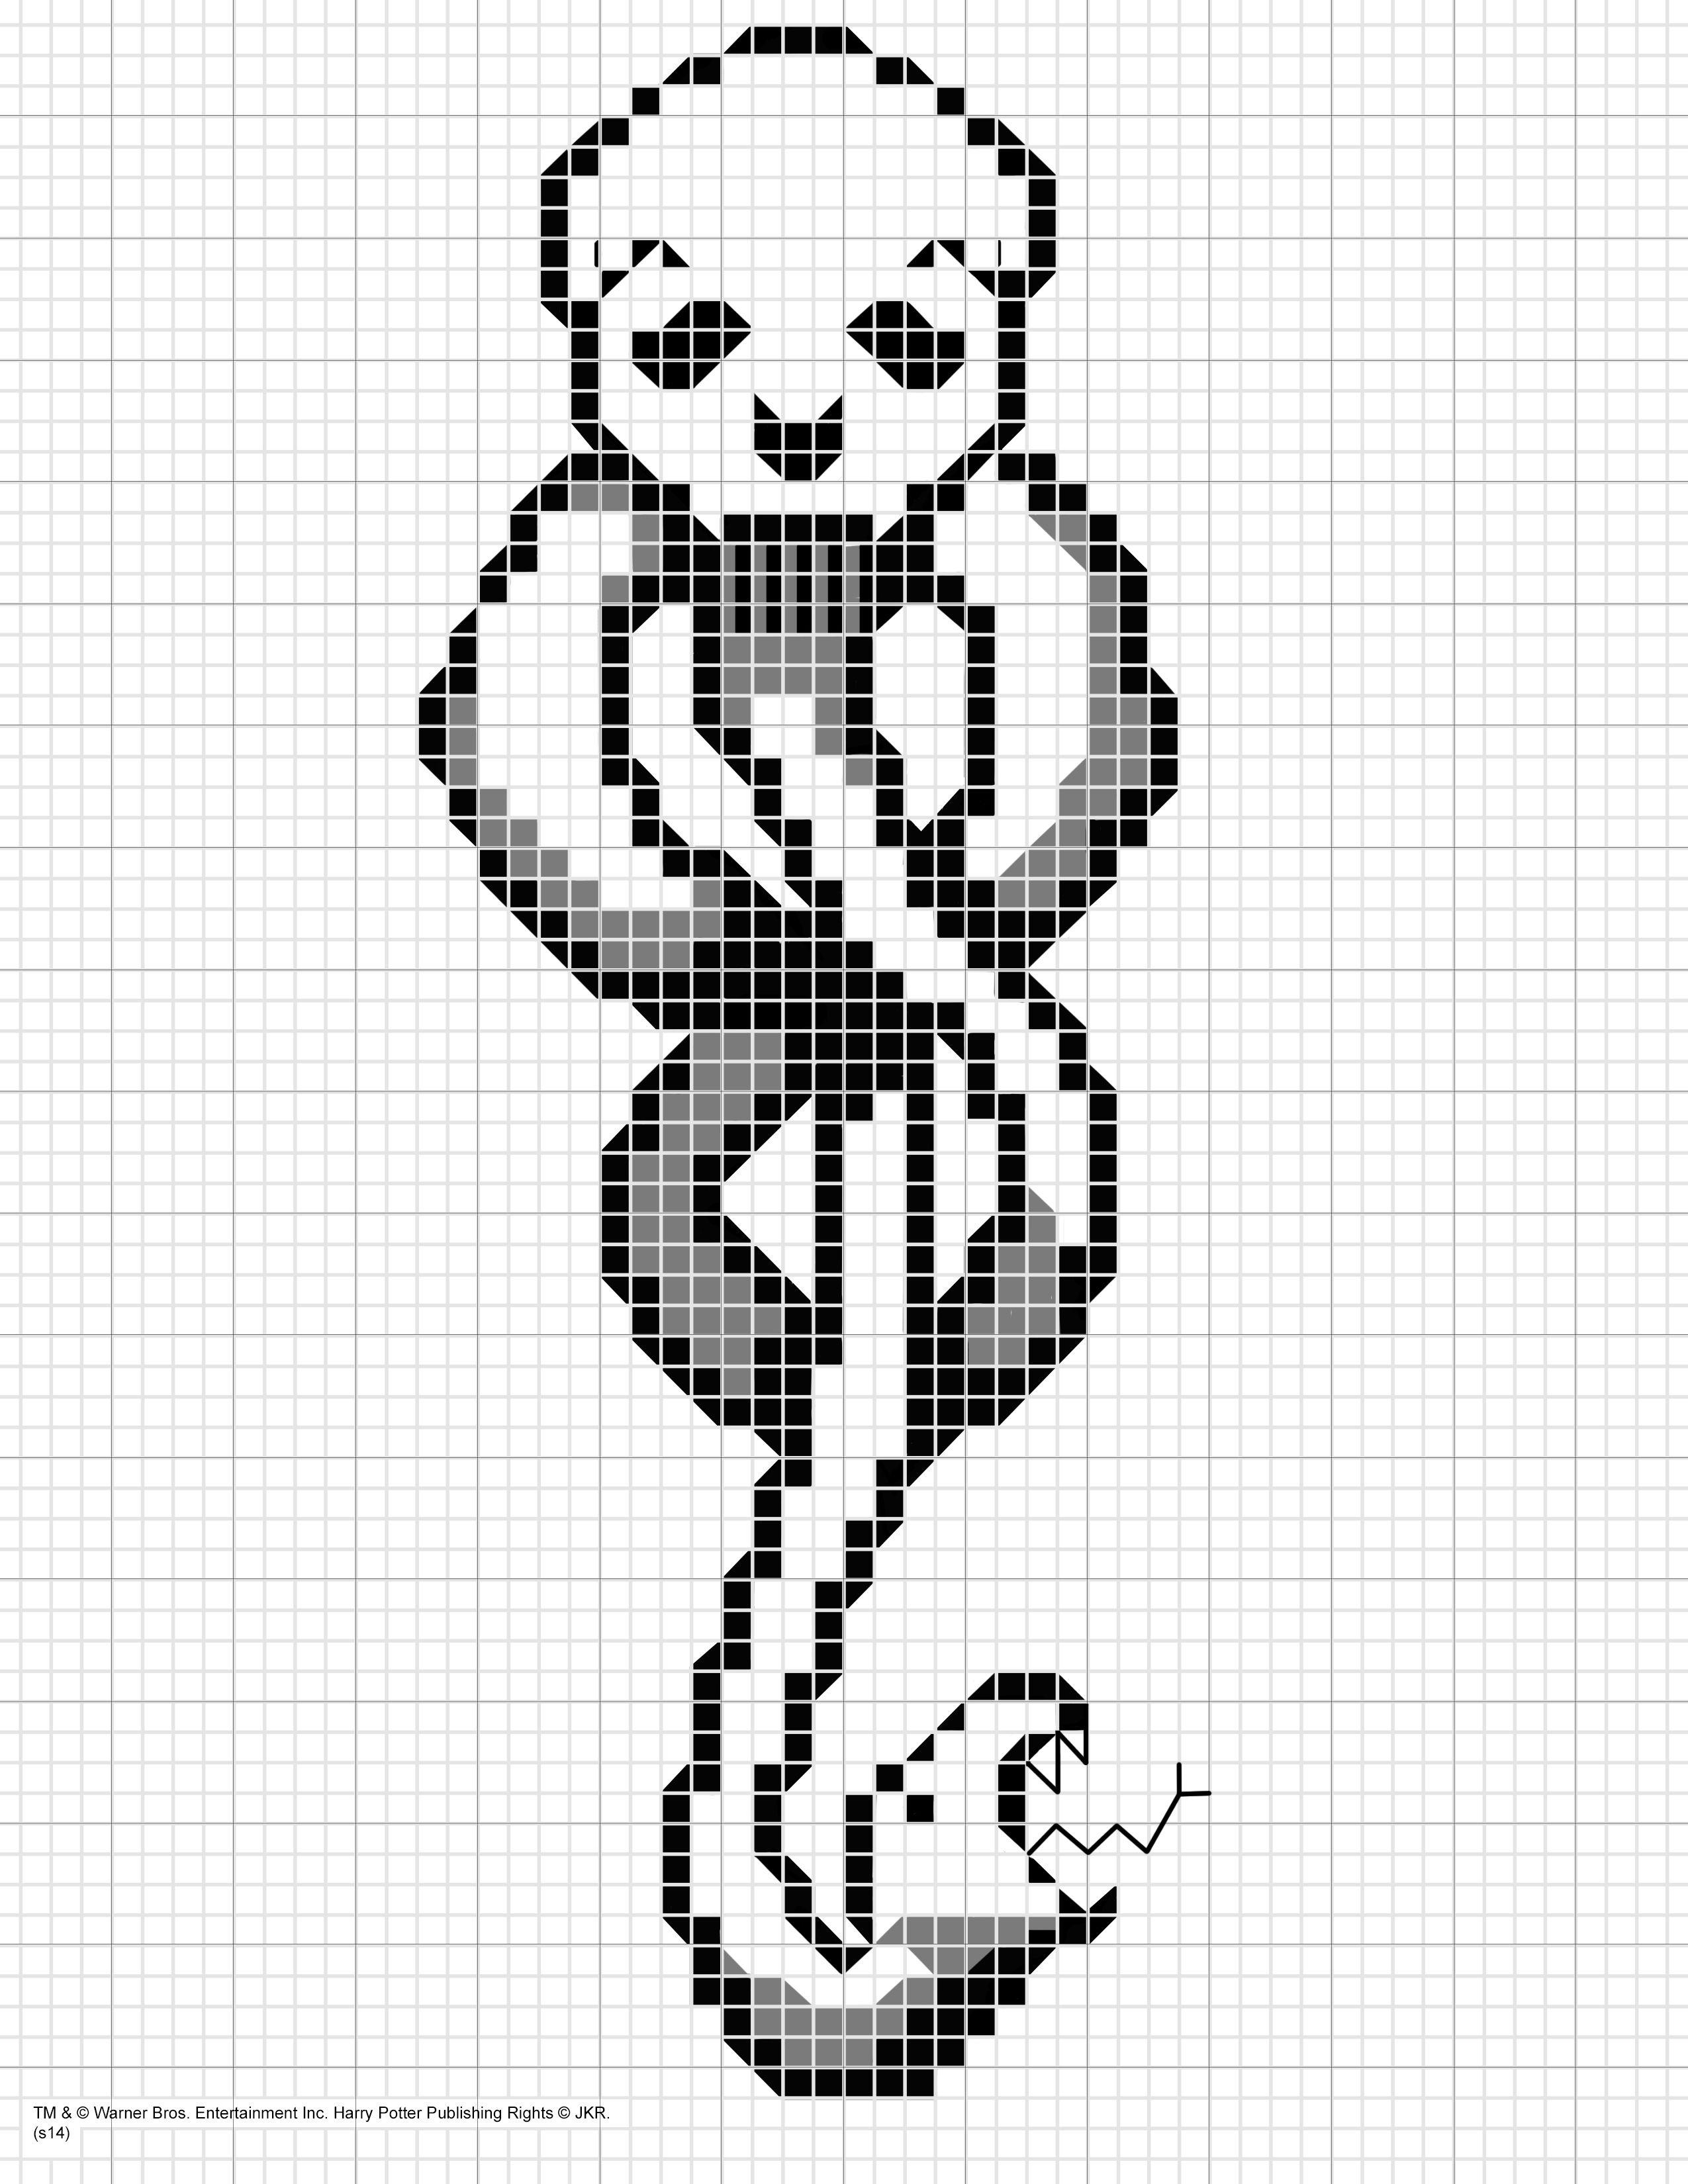 Pin de yvonne en cross stitch | Pinterest | Bordado, Costura y Puntos